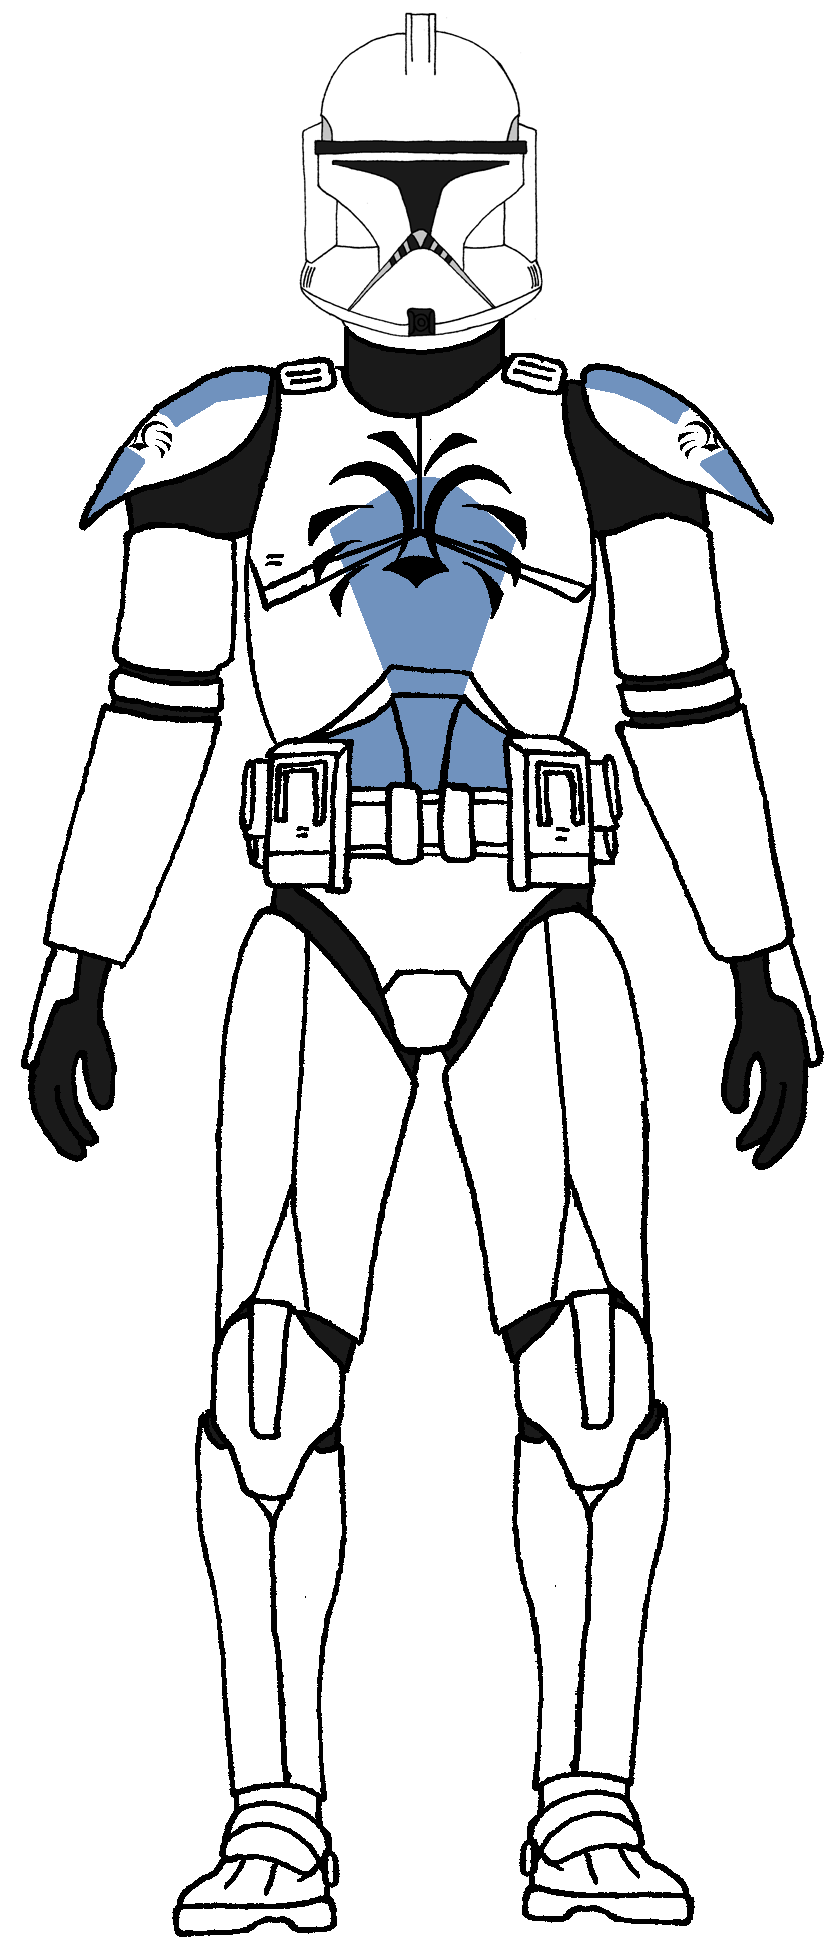 Clone Trooper Lieutenant Trap 1 Star Wars Clone Wars Star Wars Drawings Star Wars Trooper